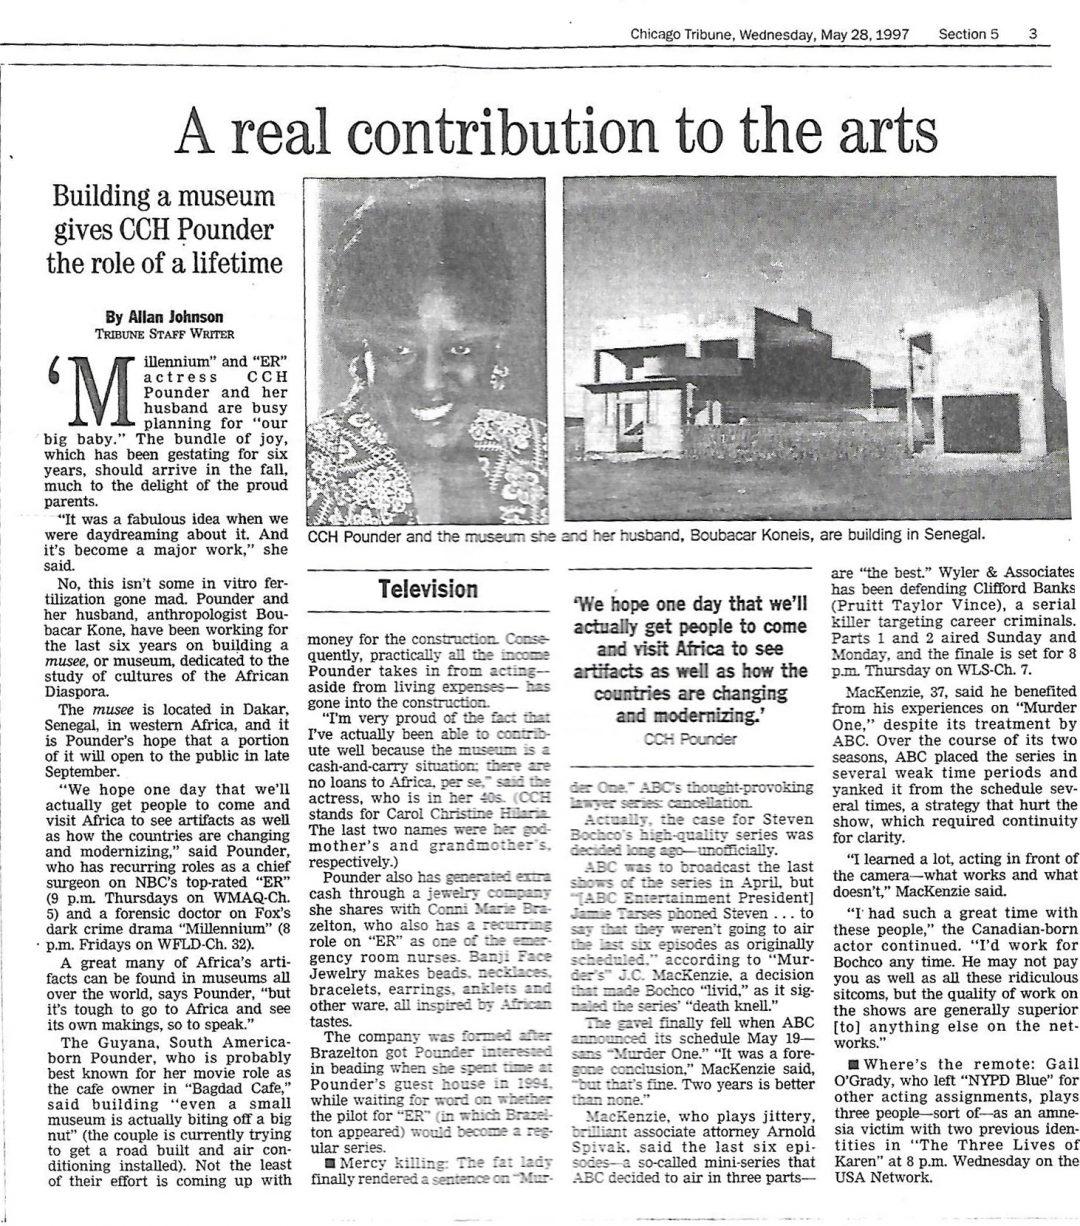 Chicago Tribune: May 28, 1997